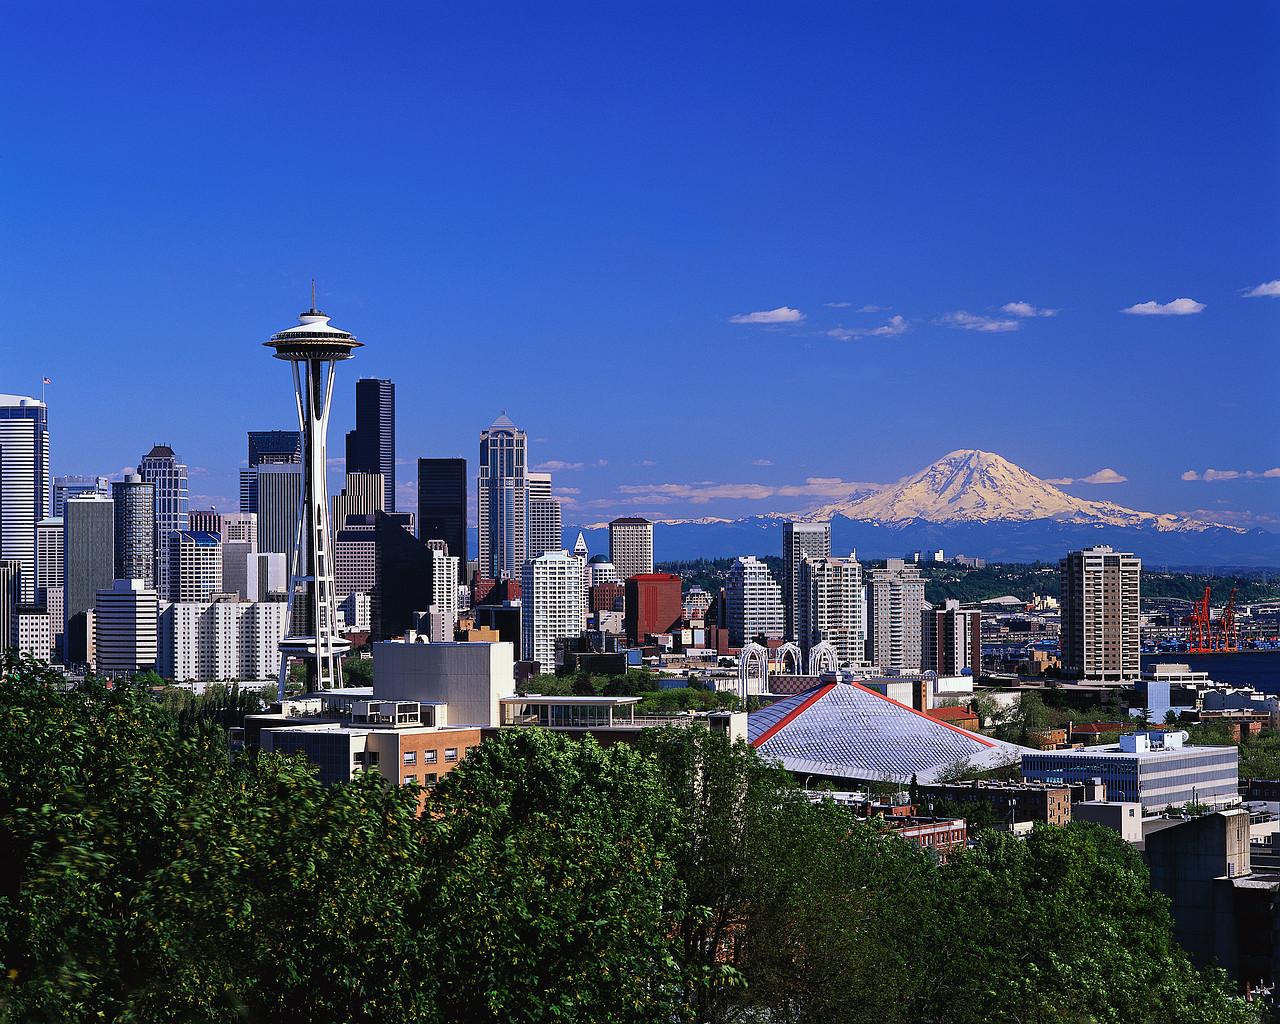 44 Mt Rainier Seattle Wallpaper On Wallpapersafari